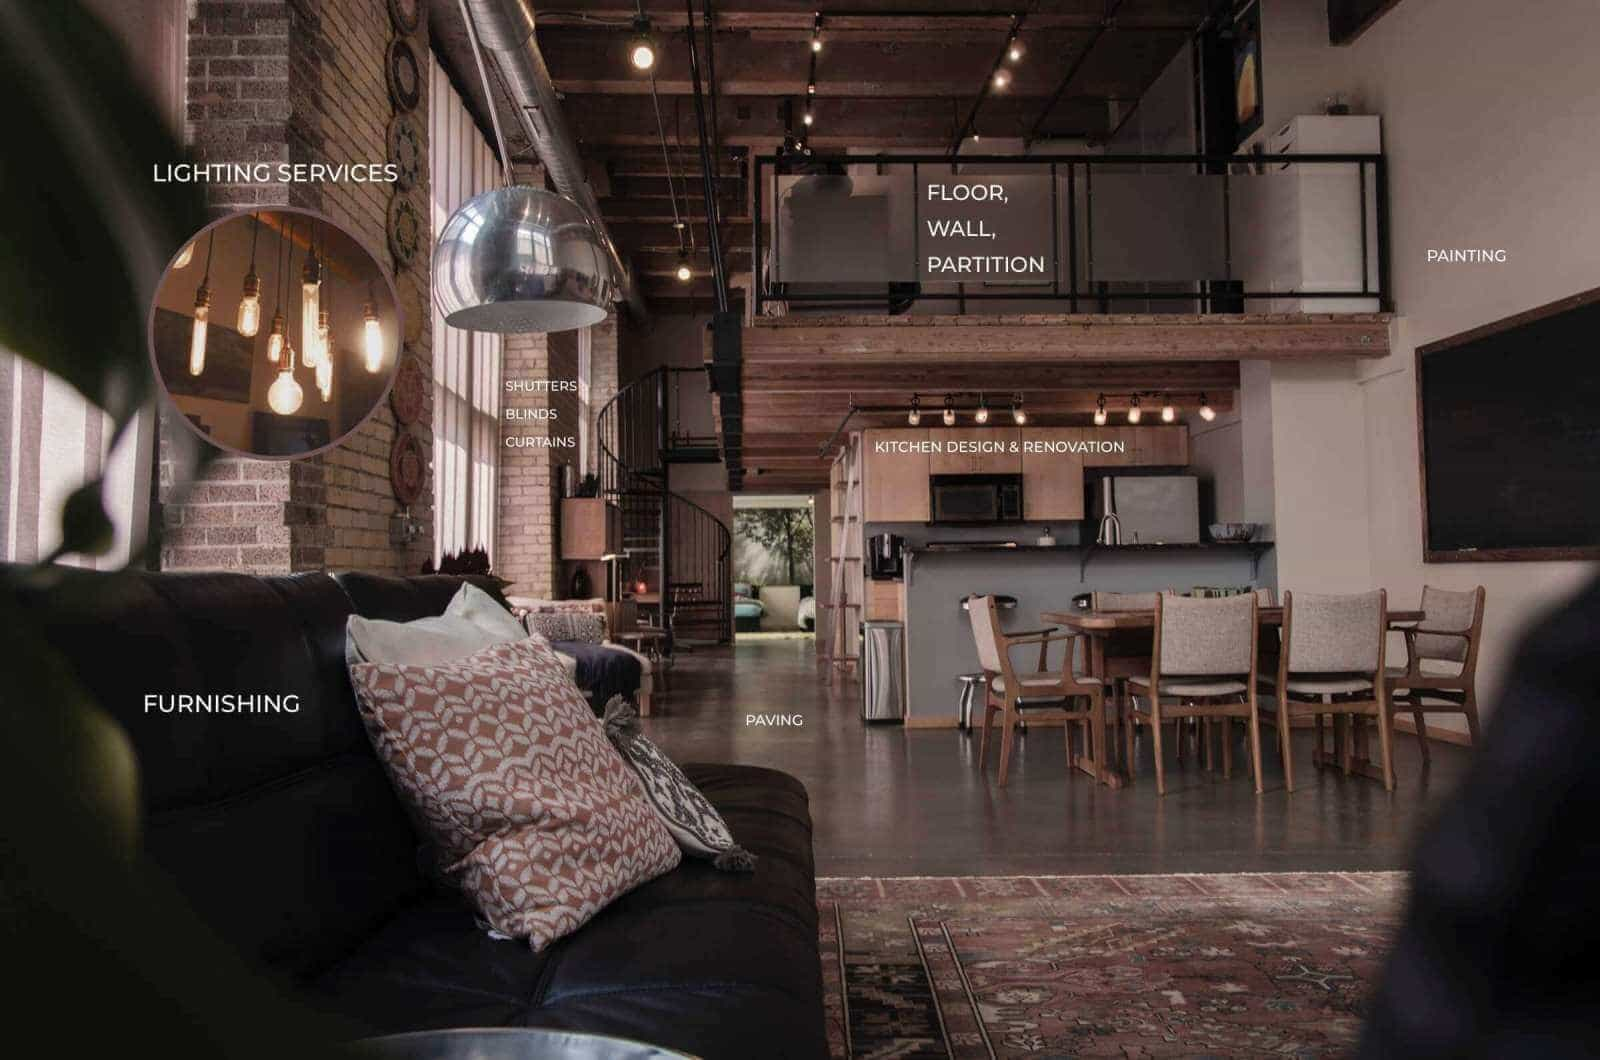 design idea for an open floor plan apartment with a loft area